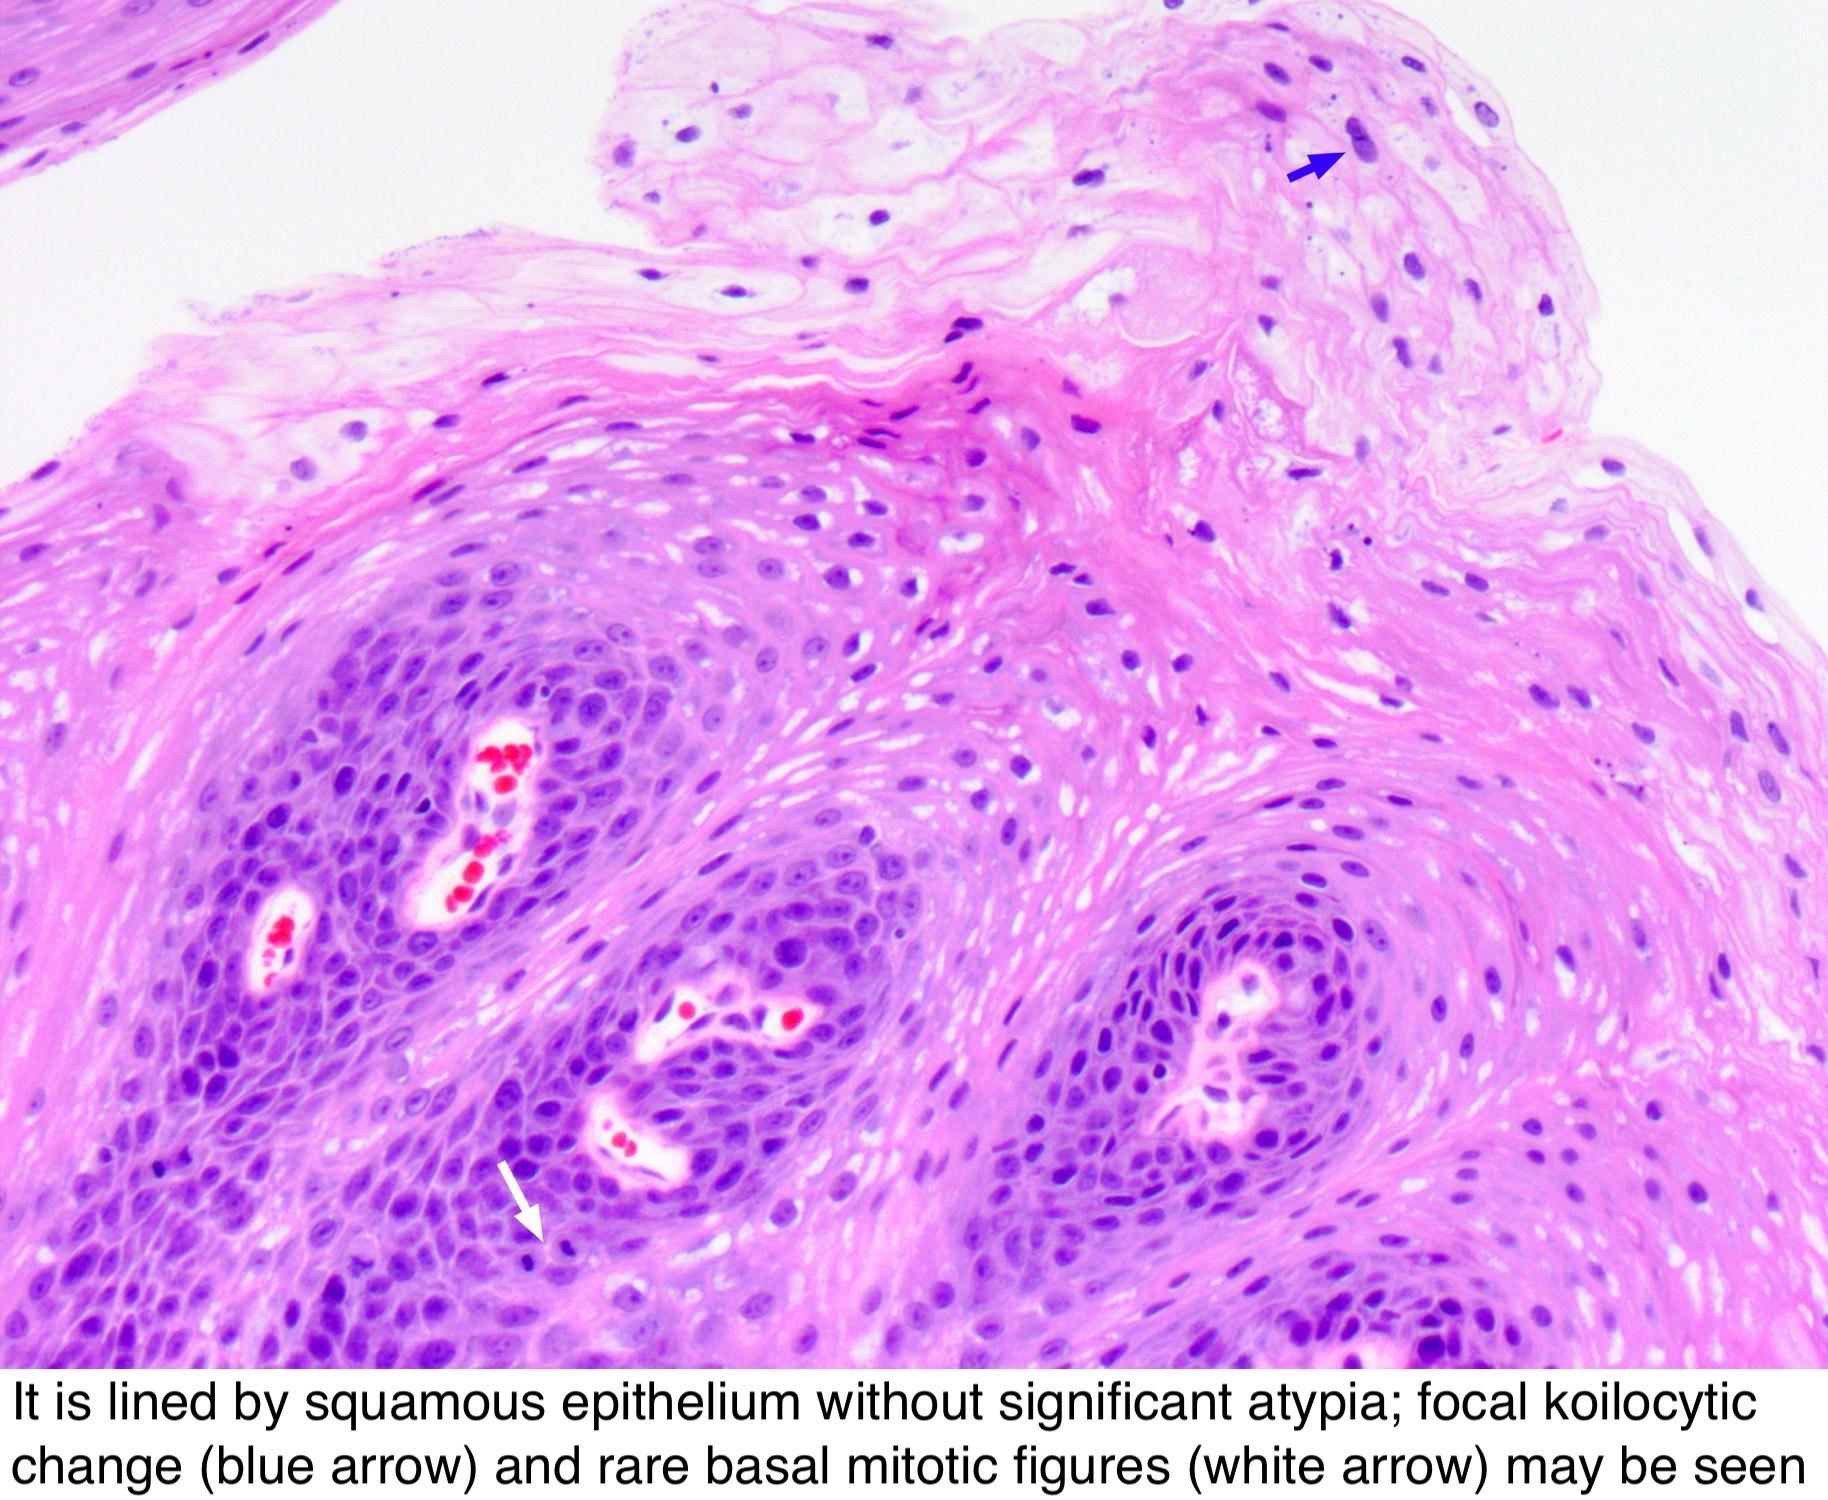 Sinonasal oncocytic papilloma